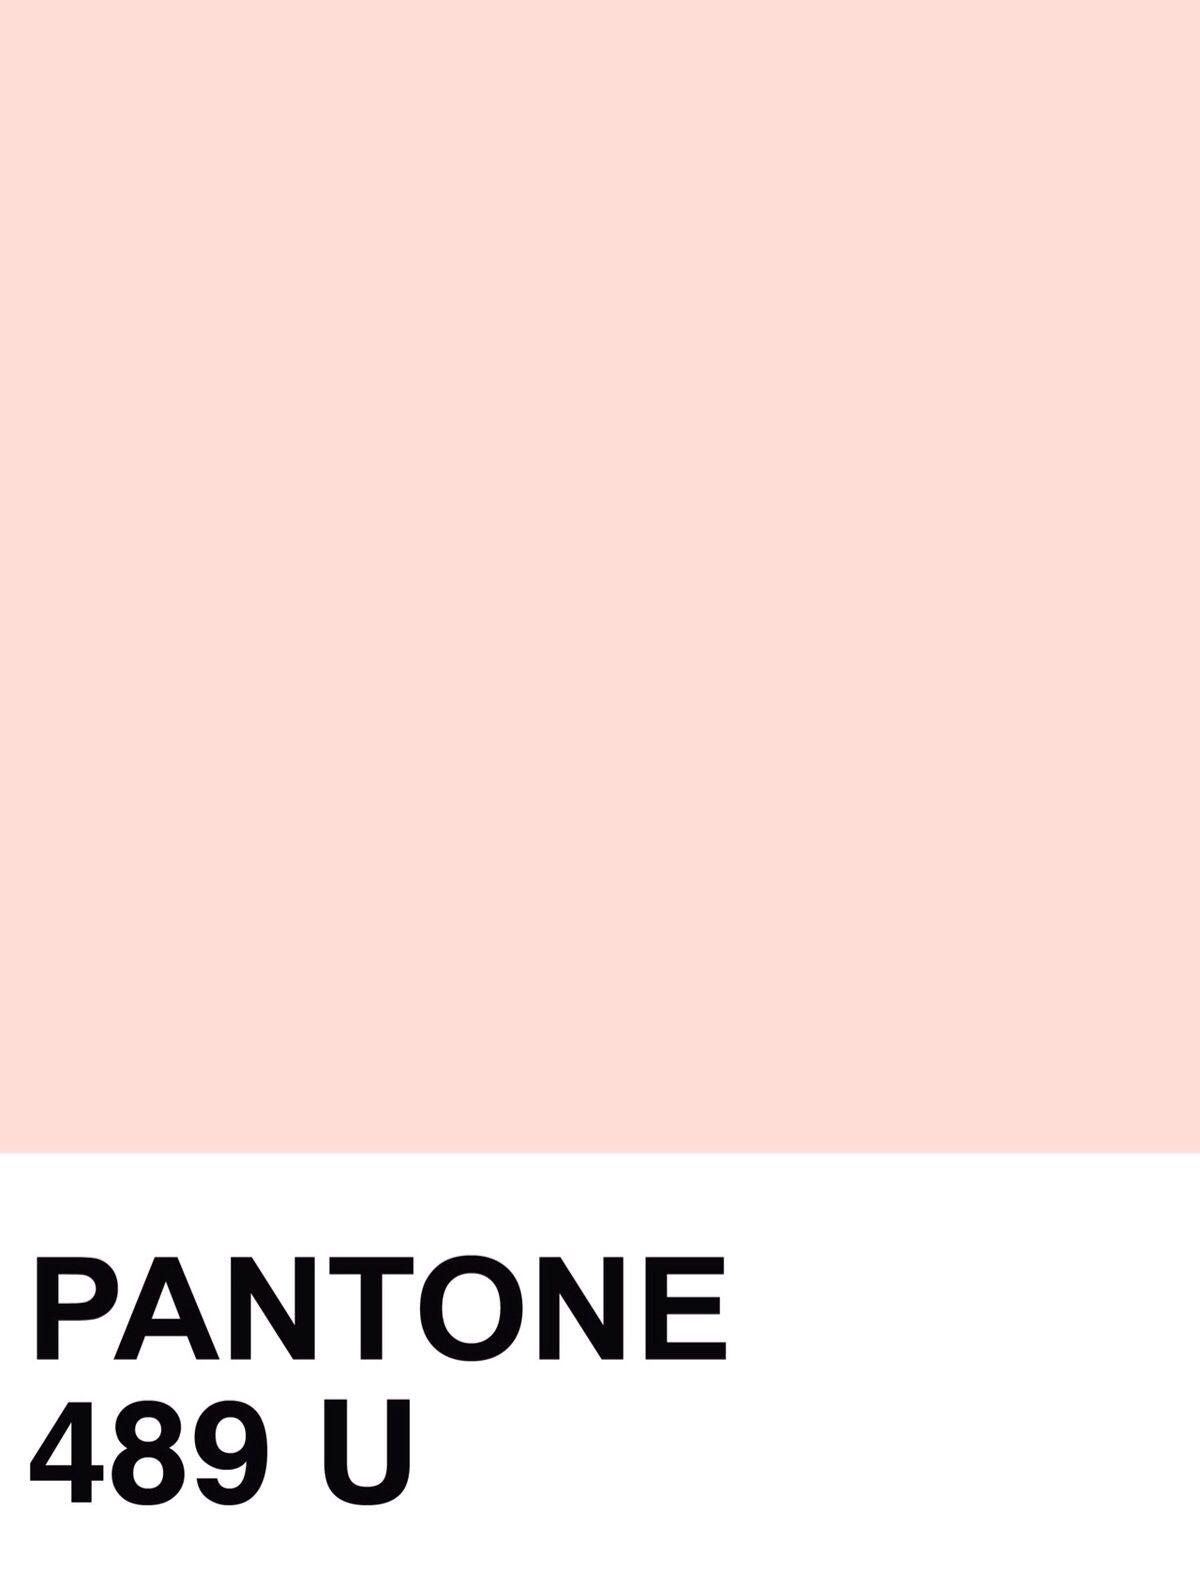 Pantone 489 U Pasteles - my favorite!   Patterns and colors ...